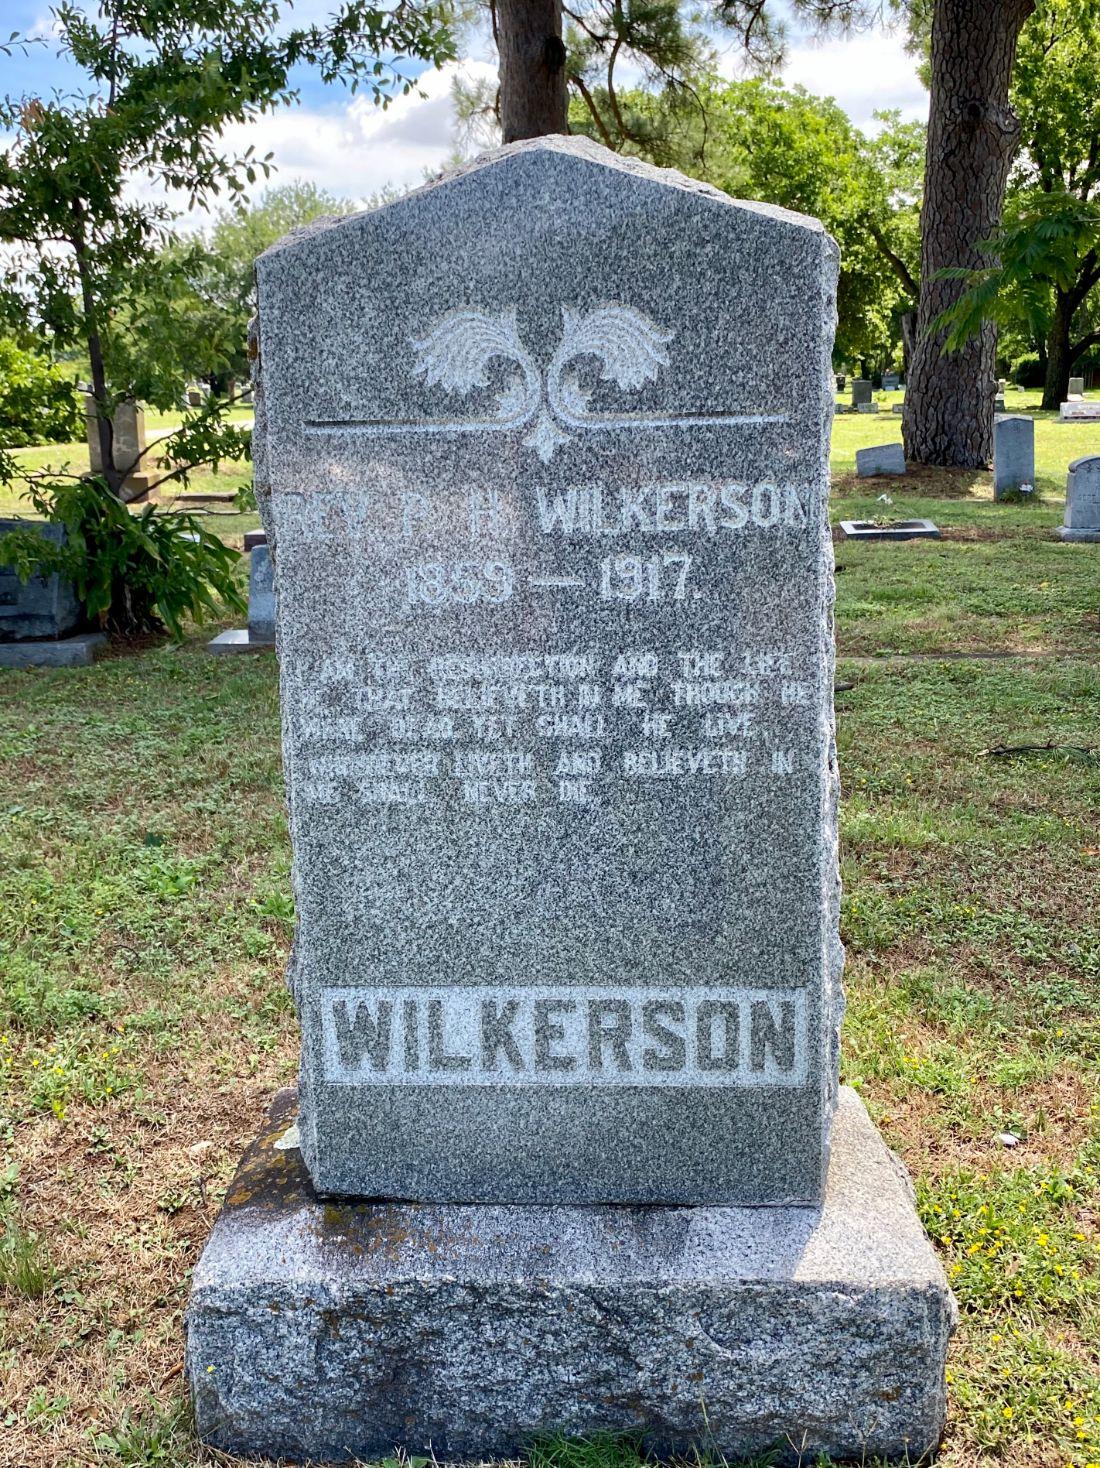 Wilkerson